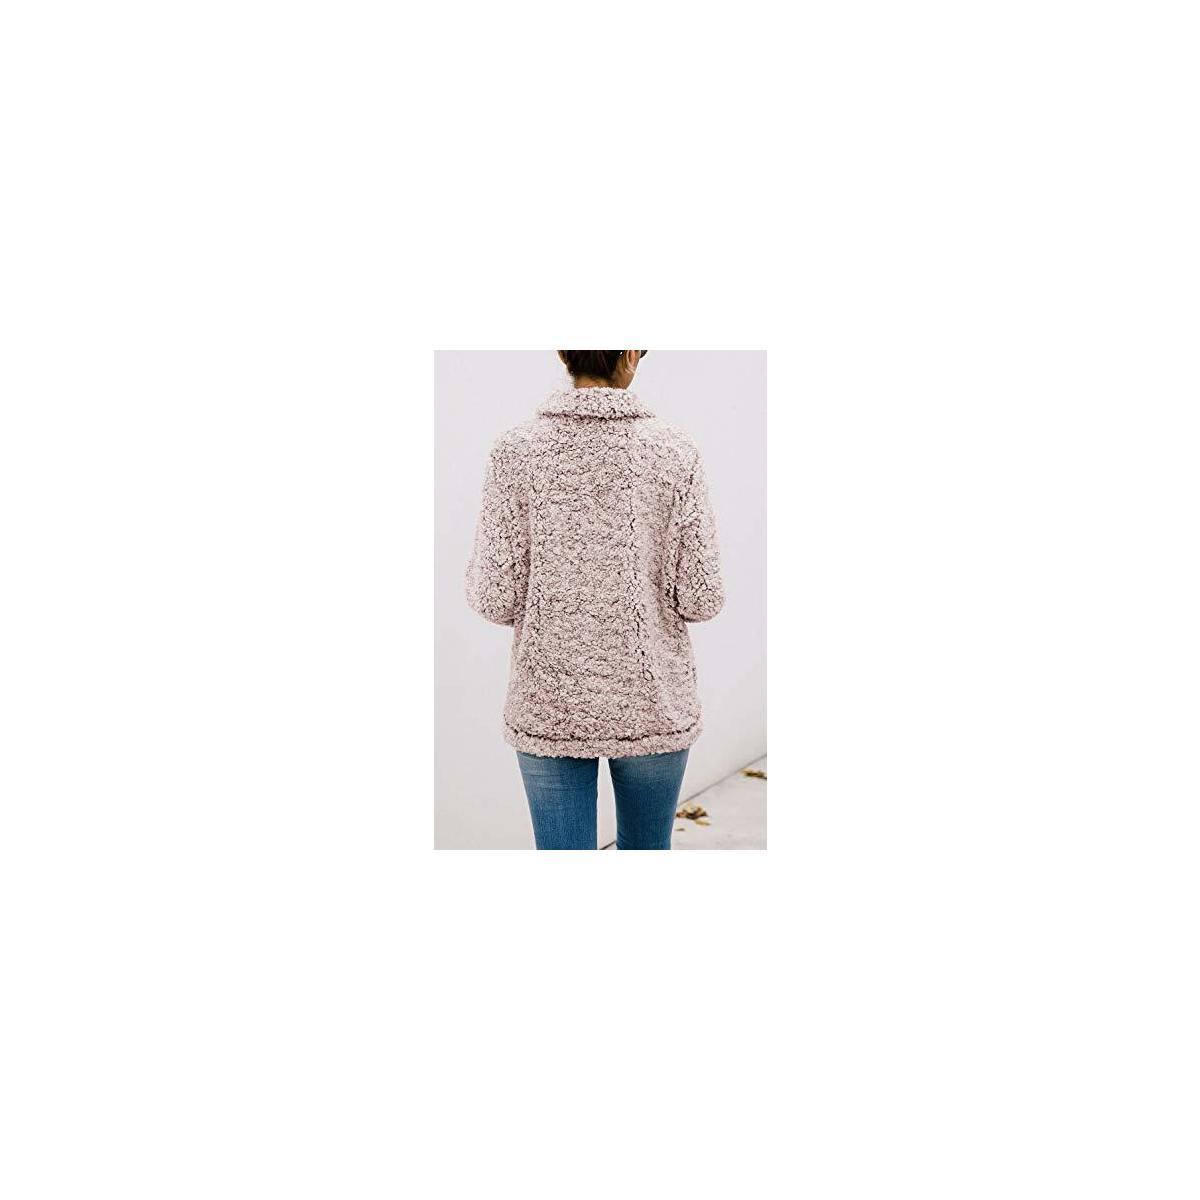 Women's Warm Fleece Color-Block Plaid Print Fluffy Sherpa Jacket Half Zipper Pullover Sweater with Pockets